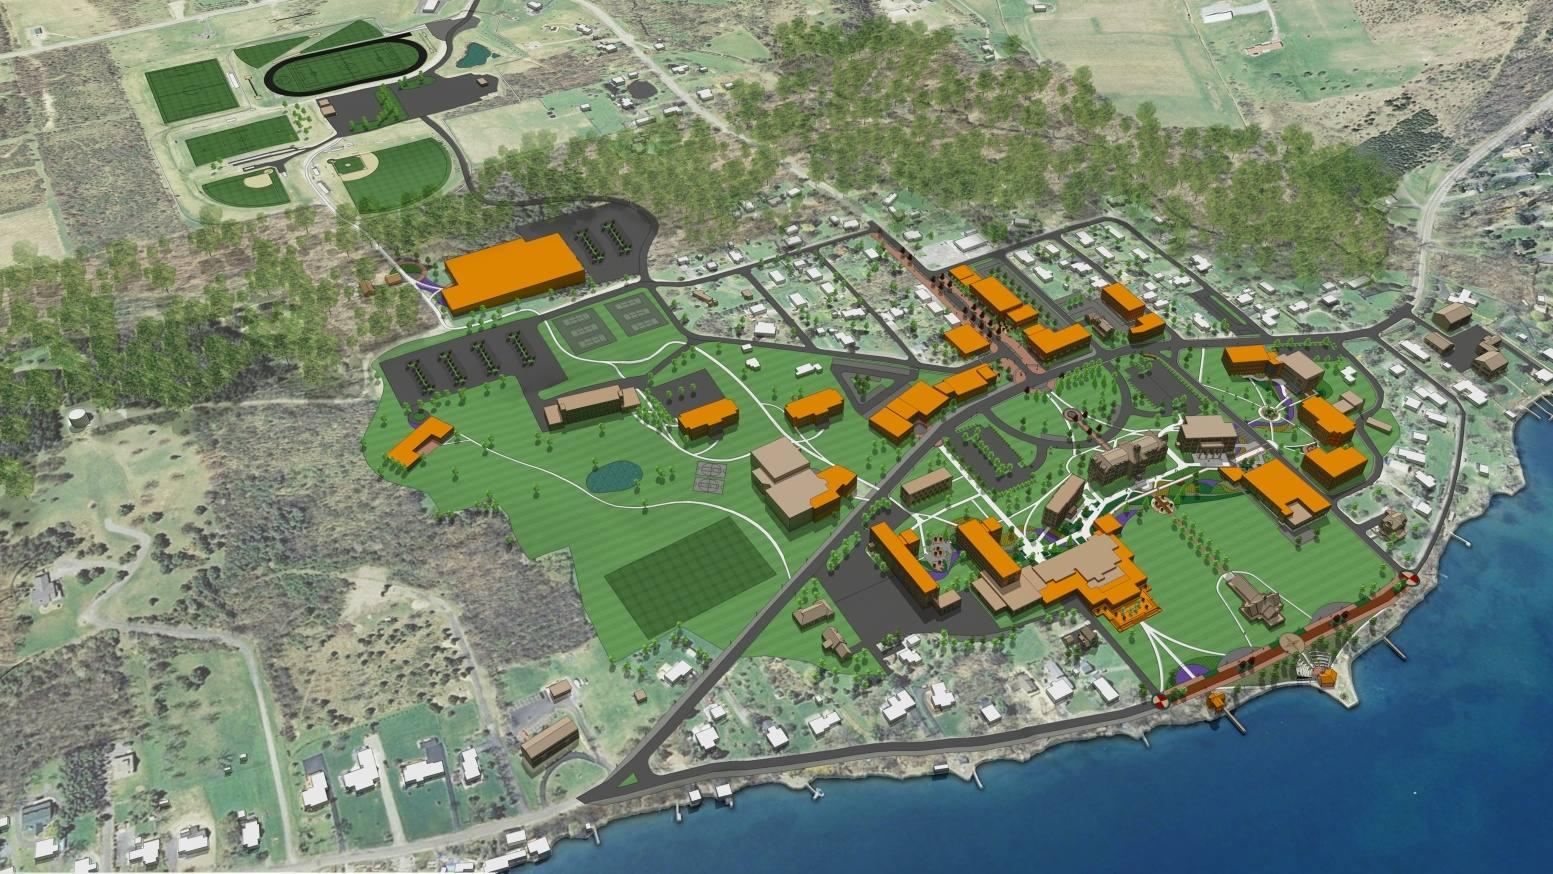 Campus Master Plan from Keuka College